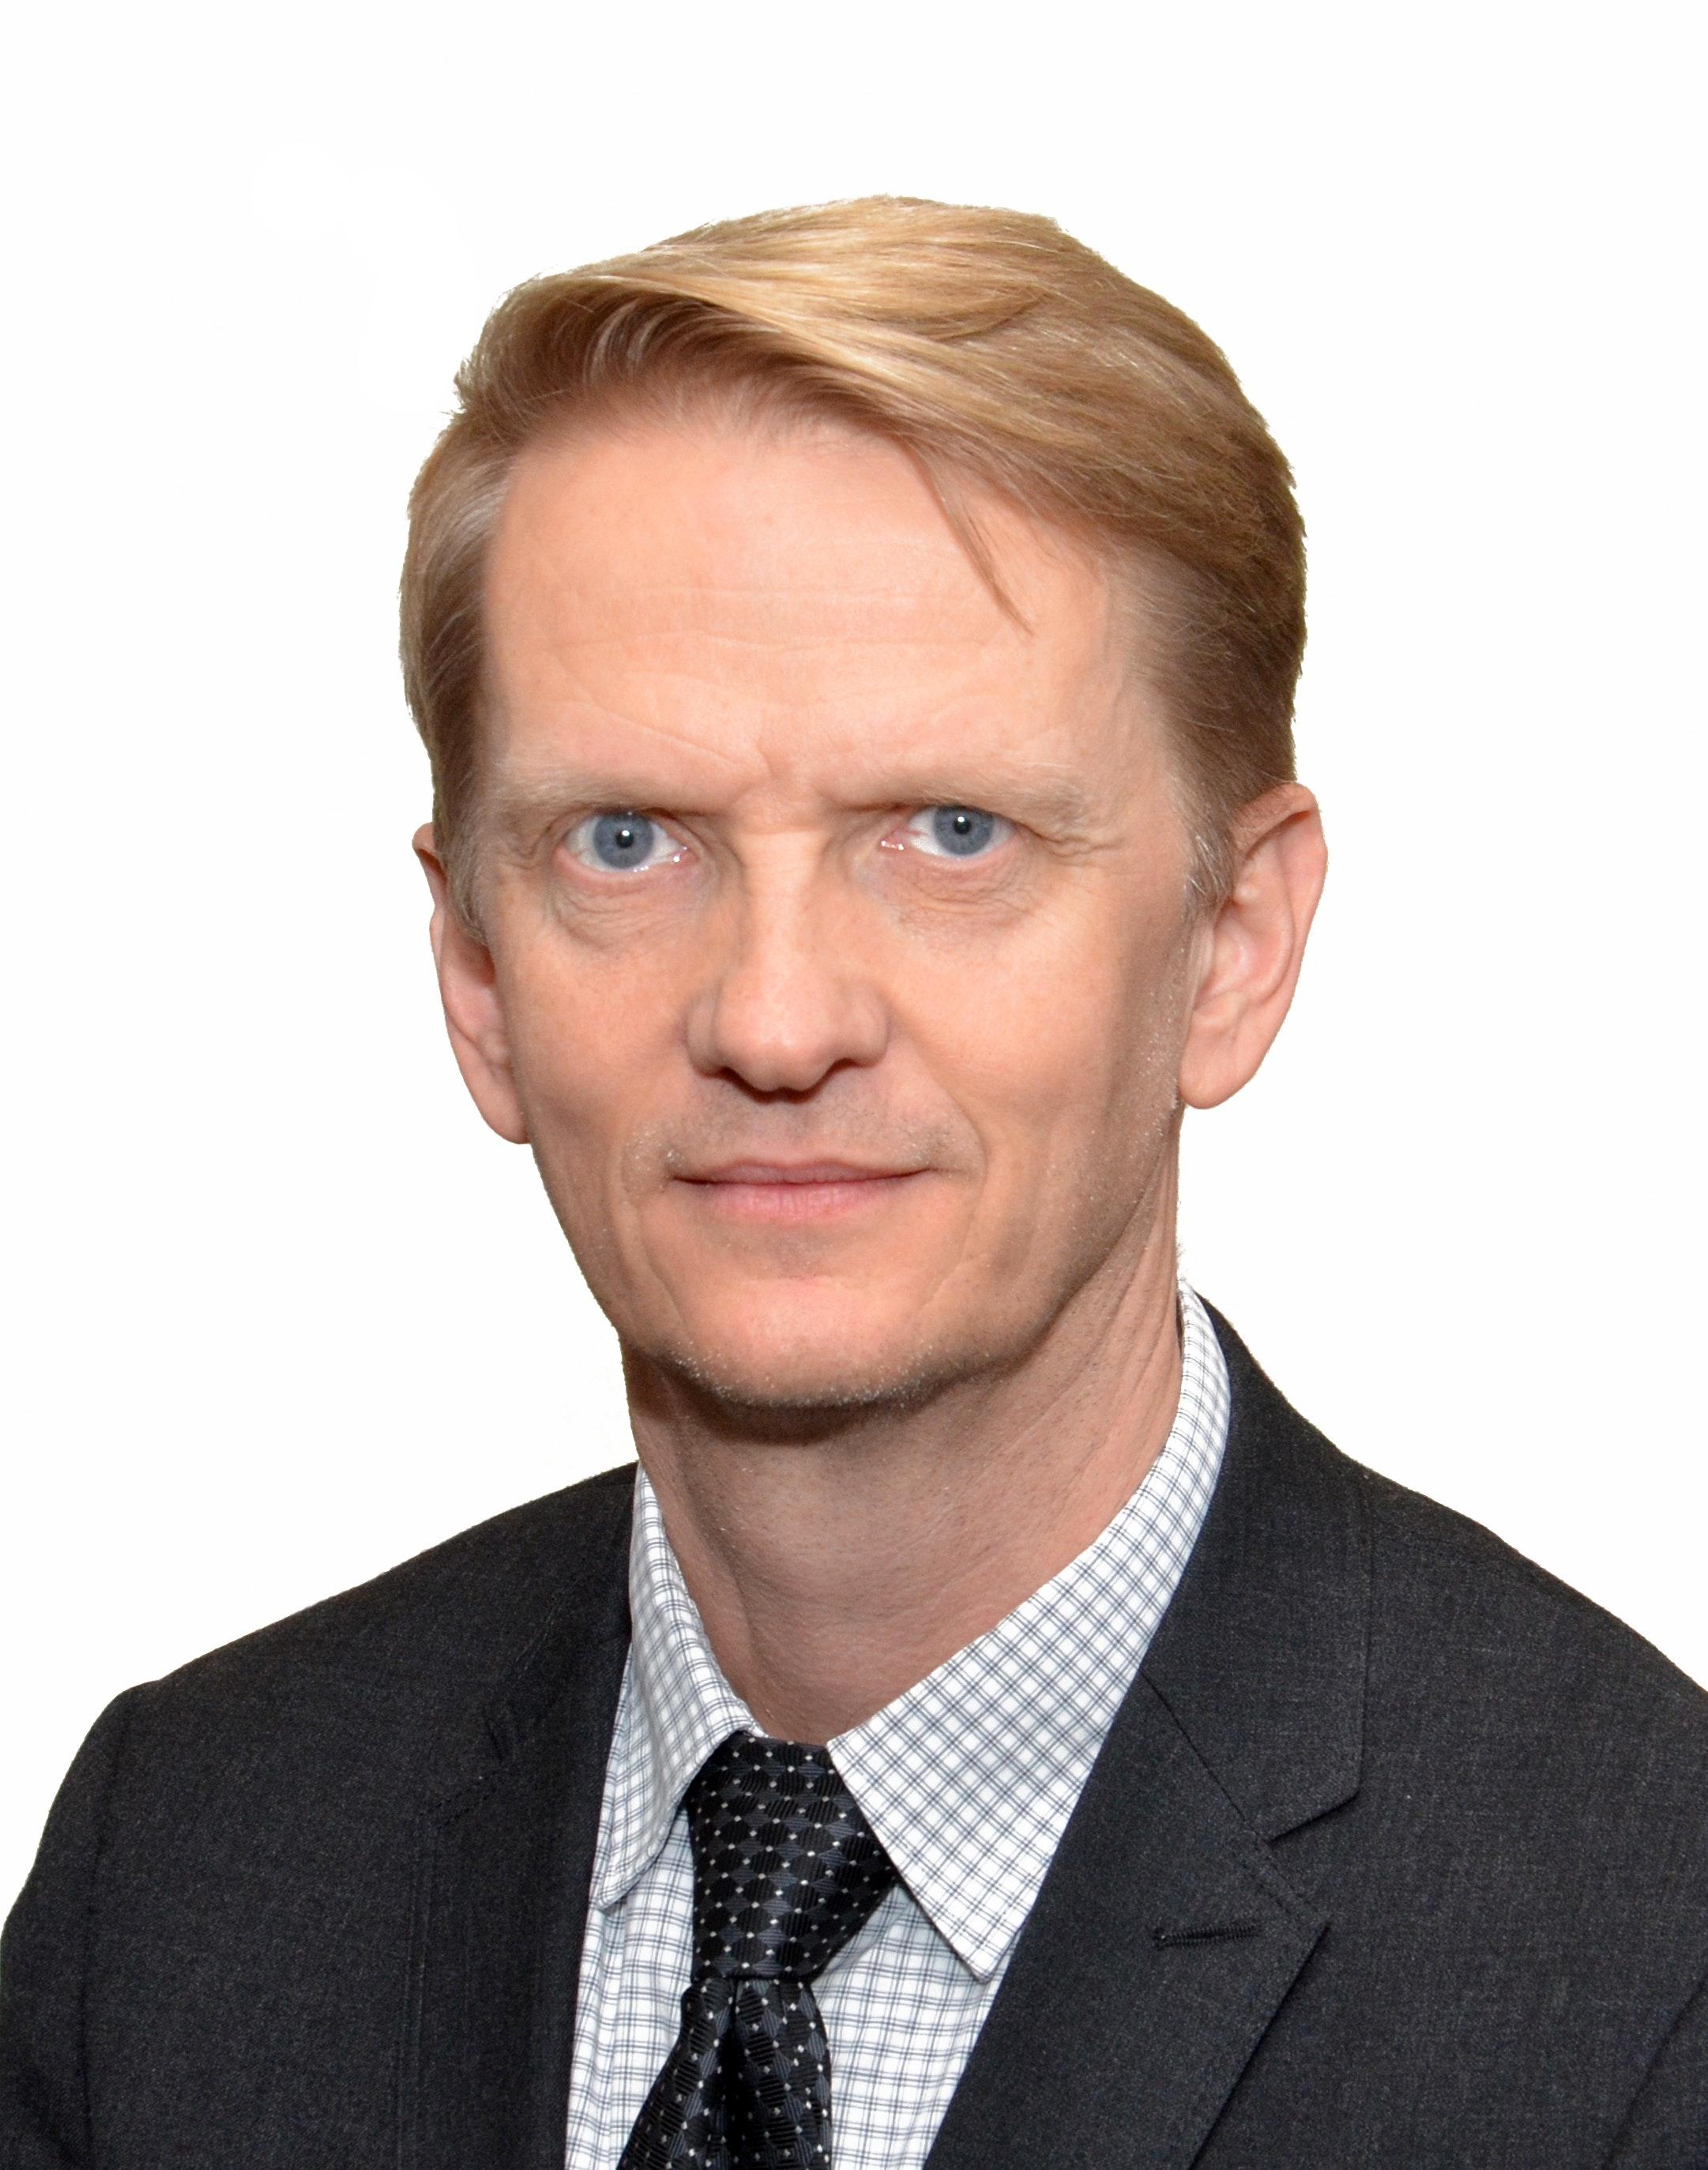 Harald Aspelund